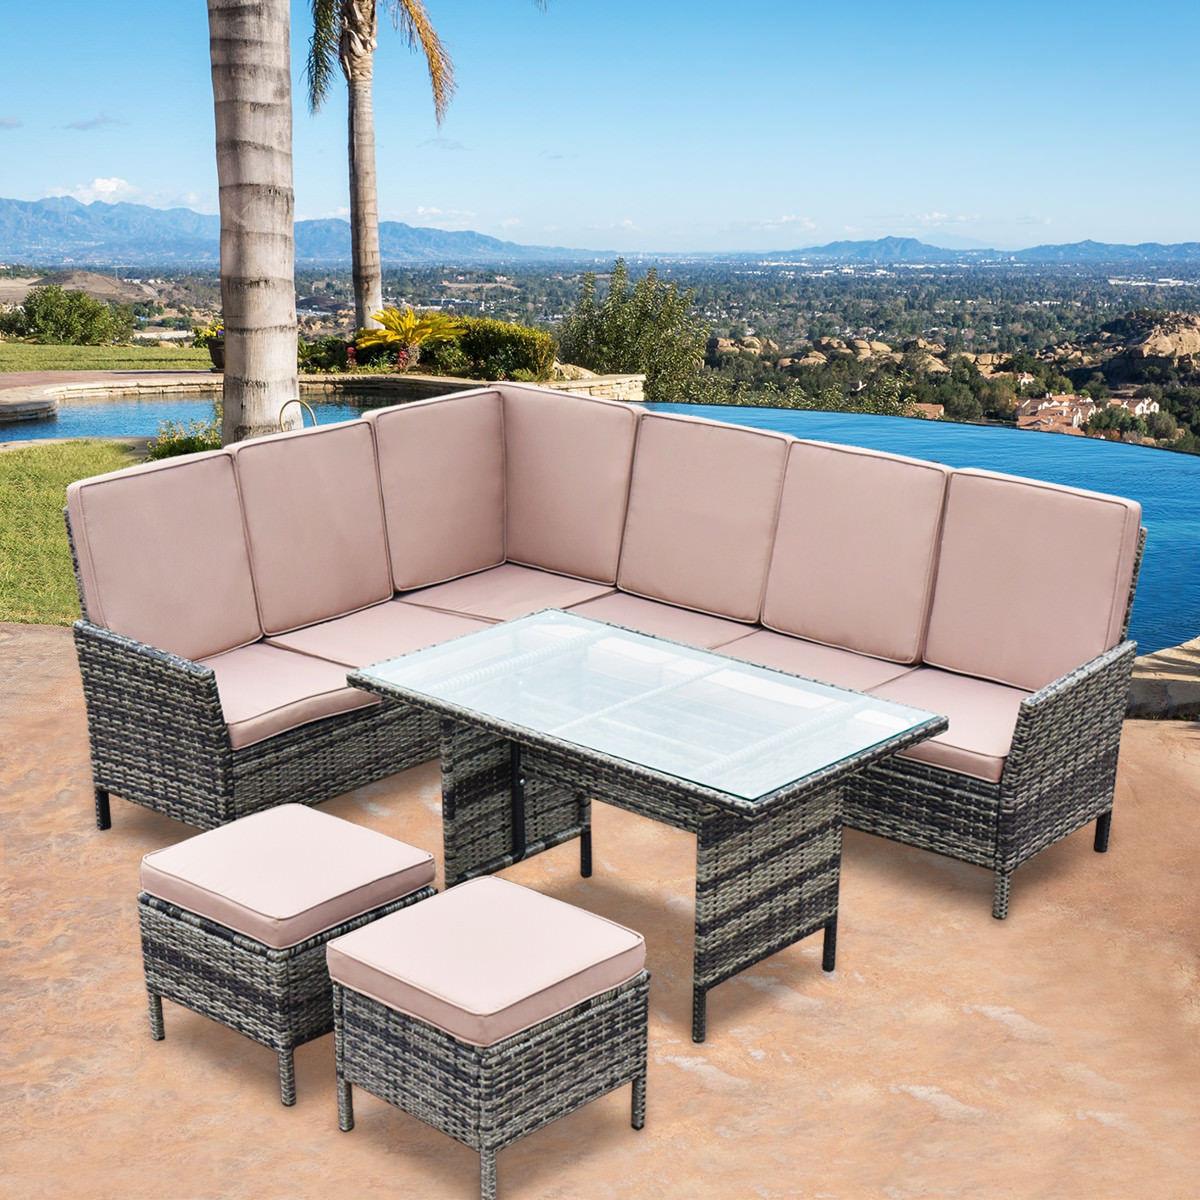 Costway 5PCS Patio Wicker Rattan Furniture Set Sofa Ottoman Garden Deck W Brown Cushion by Costway